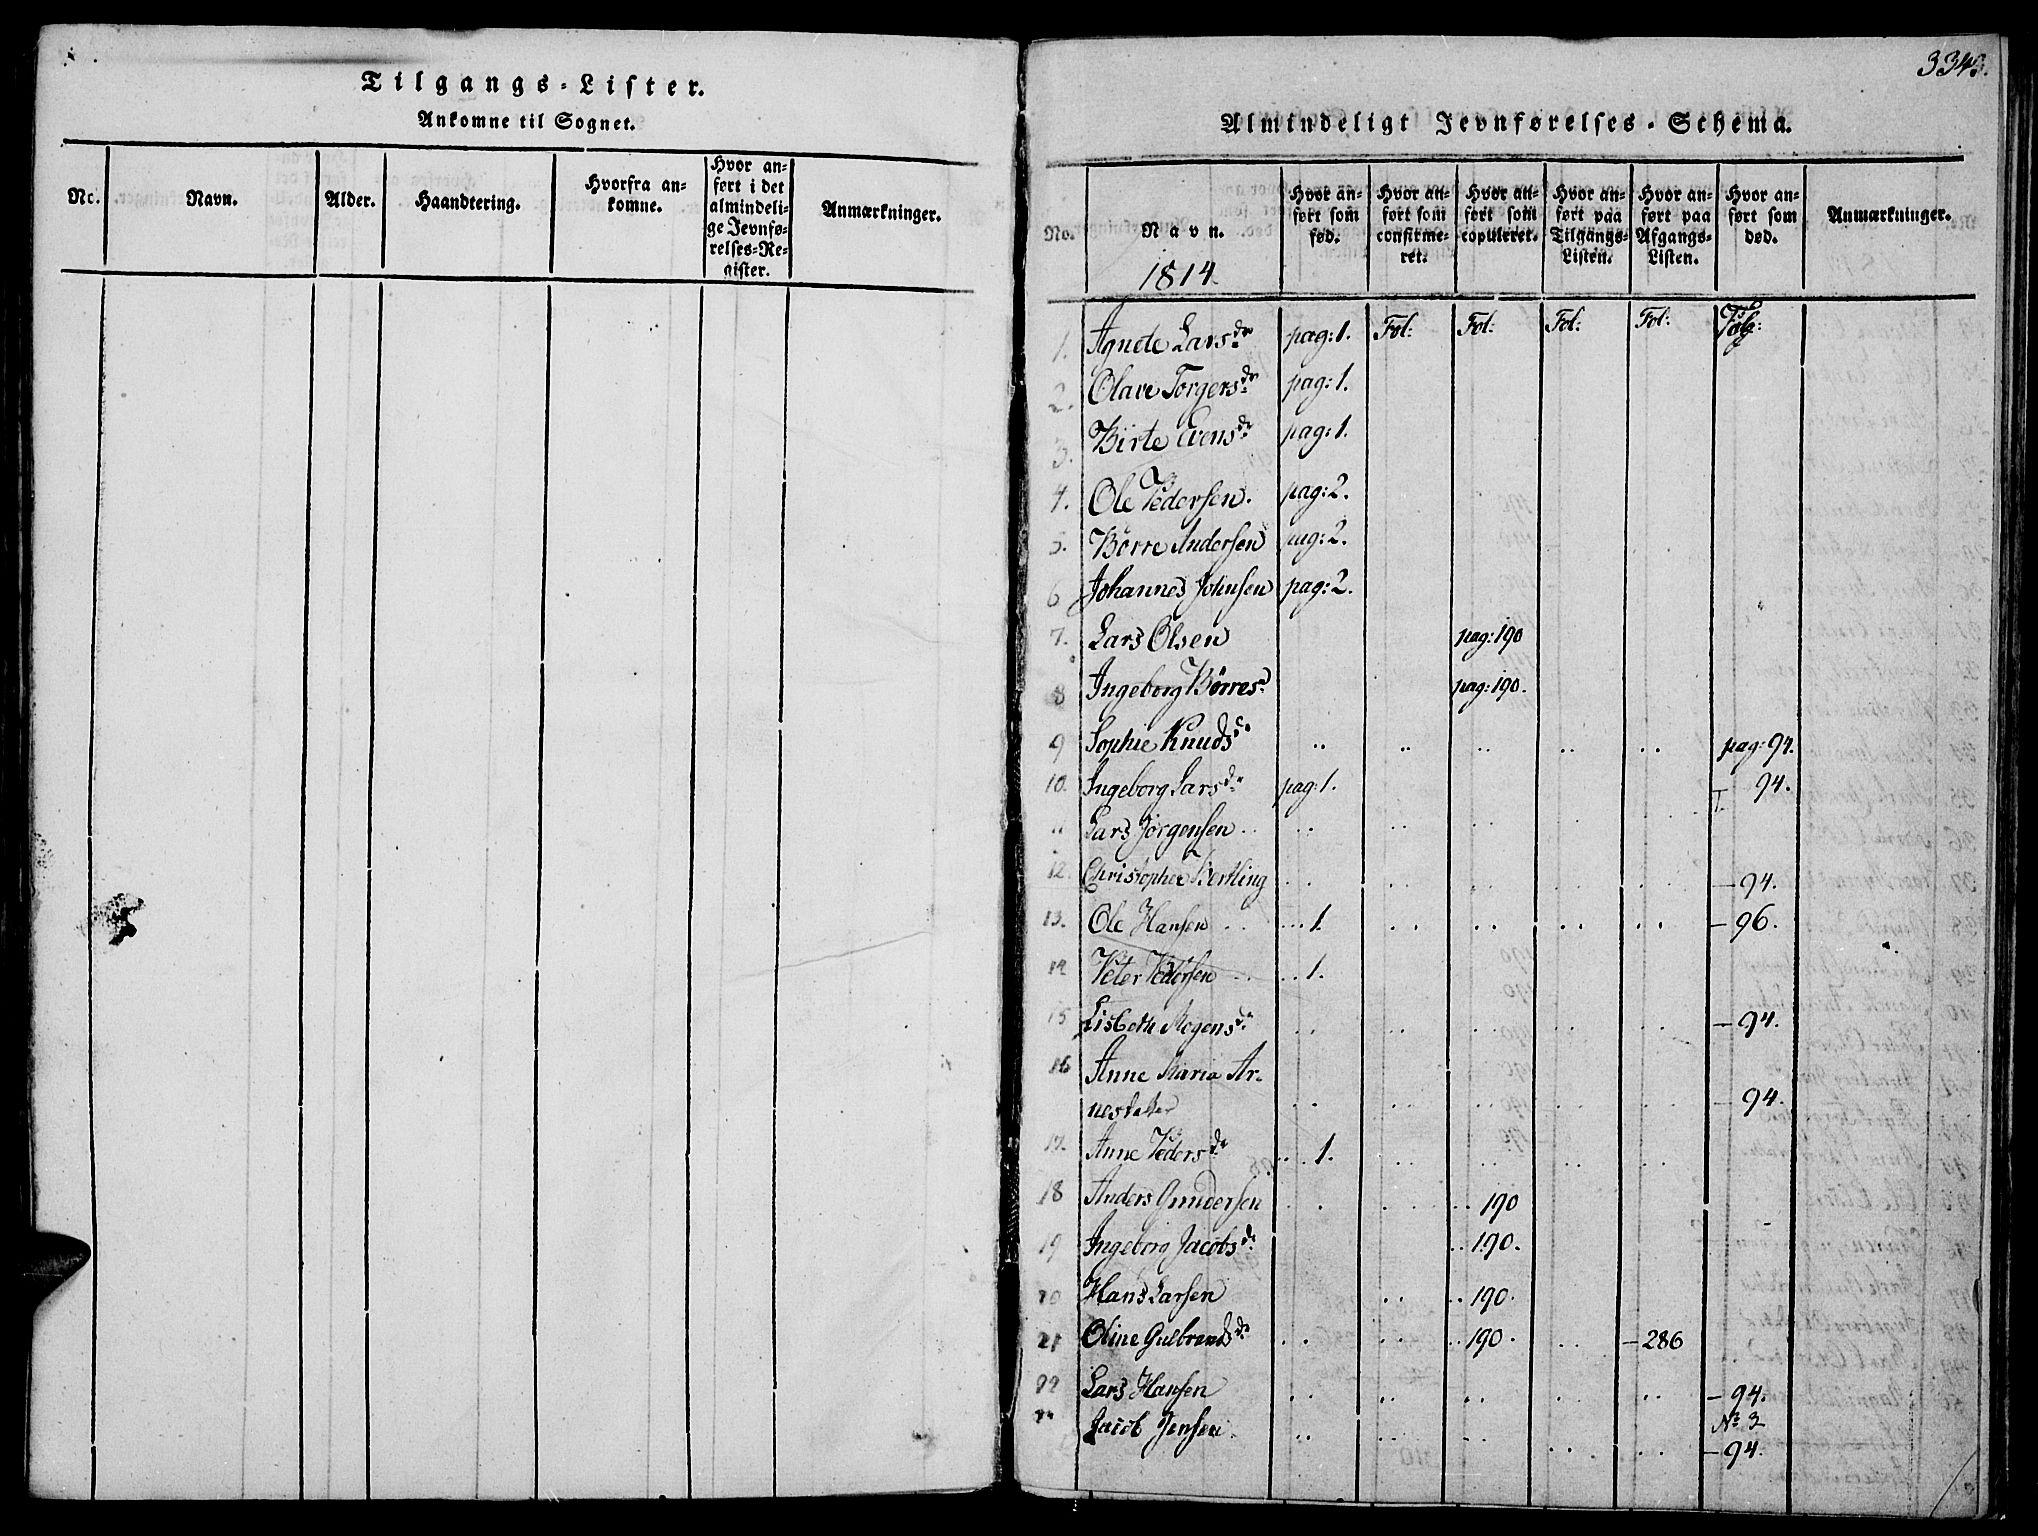 SAH, Biri prestekontor, Ministerialbok nr. 3, 1814-1828, s. 334